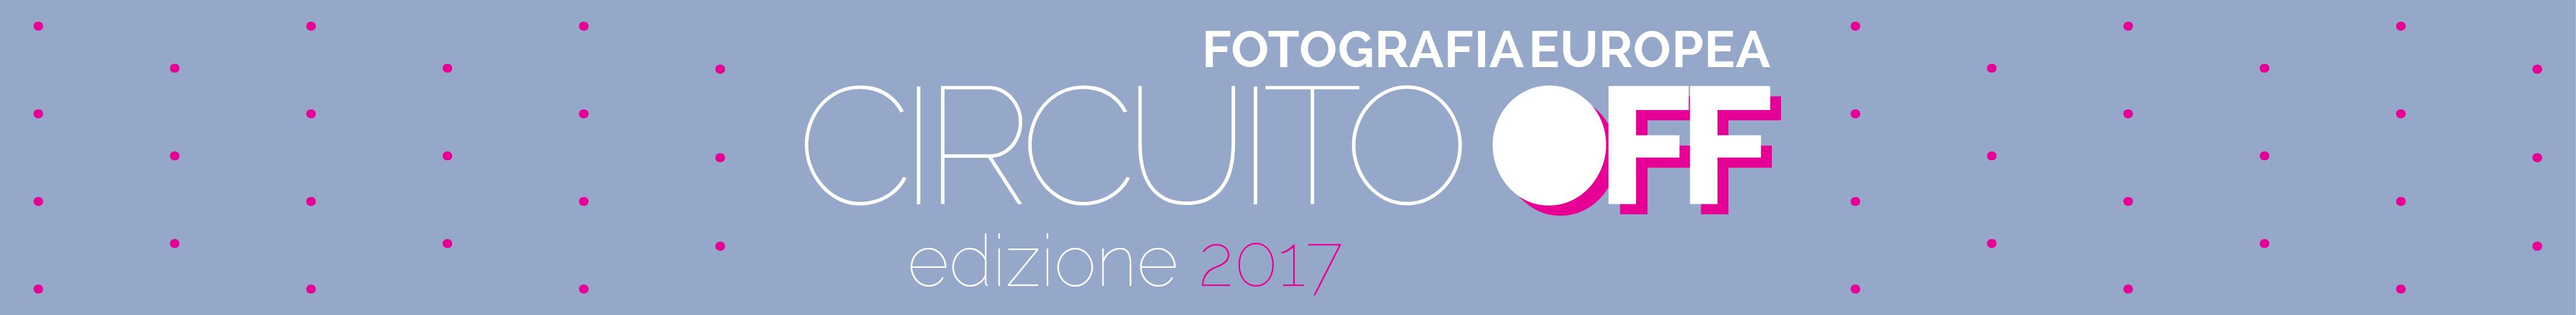 Circuito off Fotografia Europea 2017